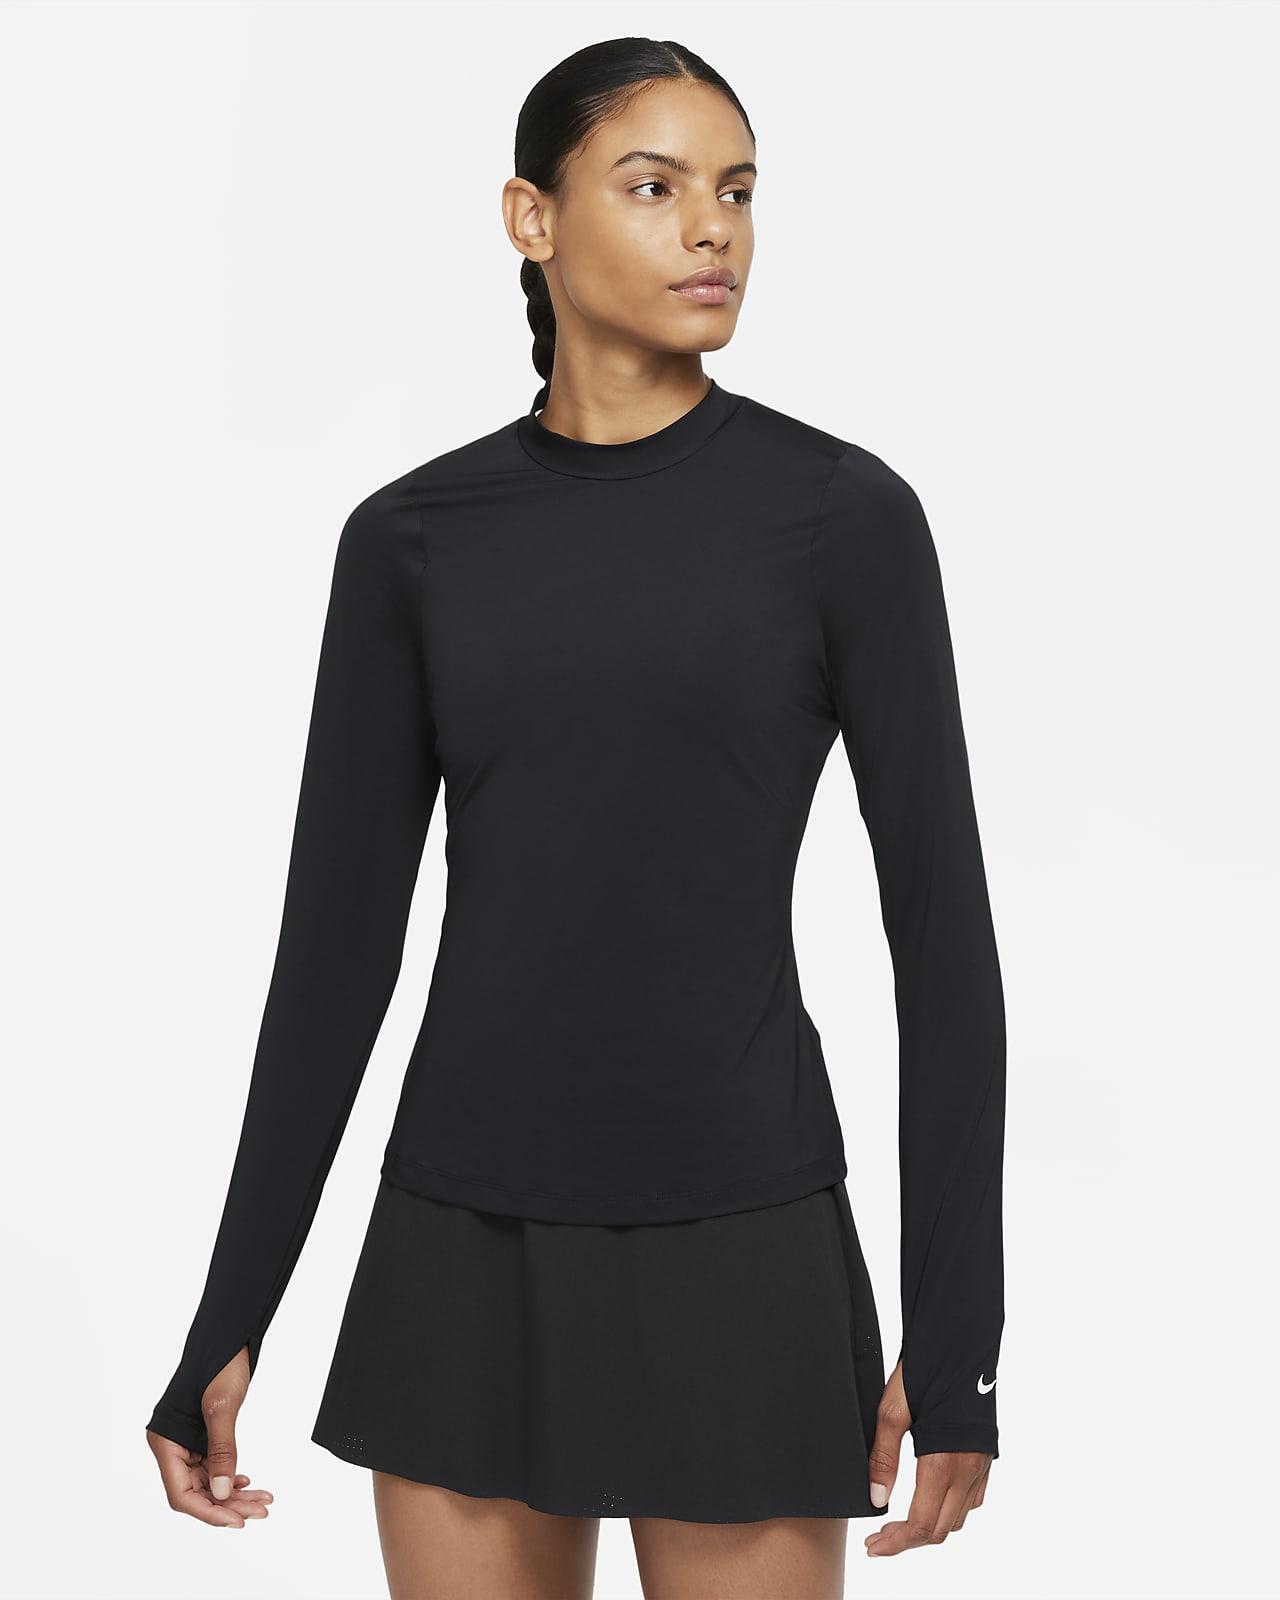 Nike Dri-FIT UV Victory Women's Long-Sleeve Golf Top